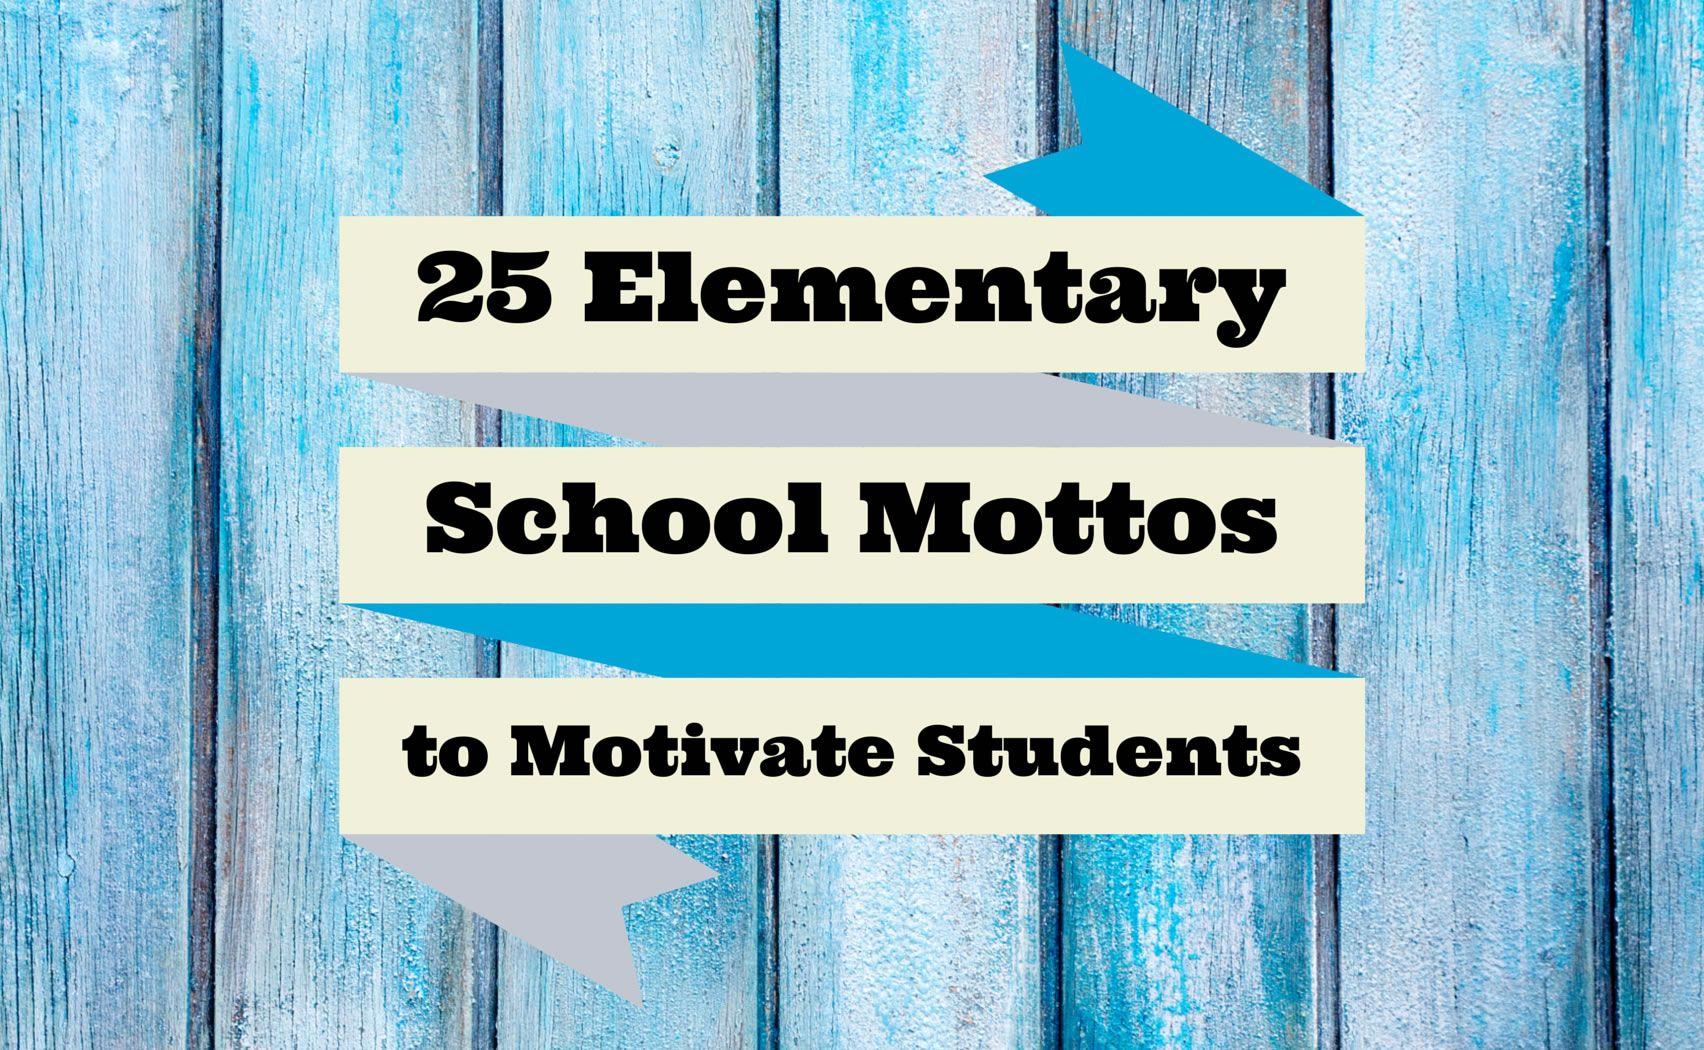 25-Elementary-School-Mottos-to-Motivate-Students-Main ...